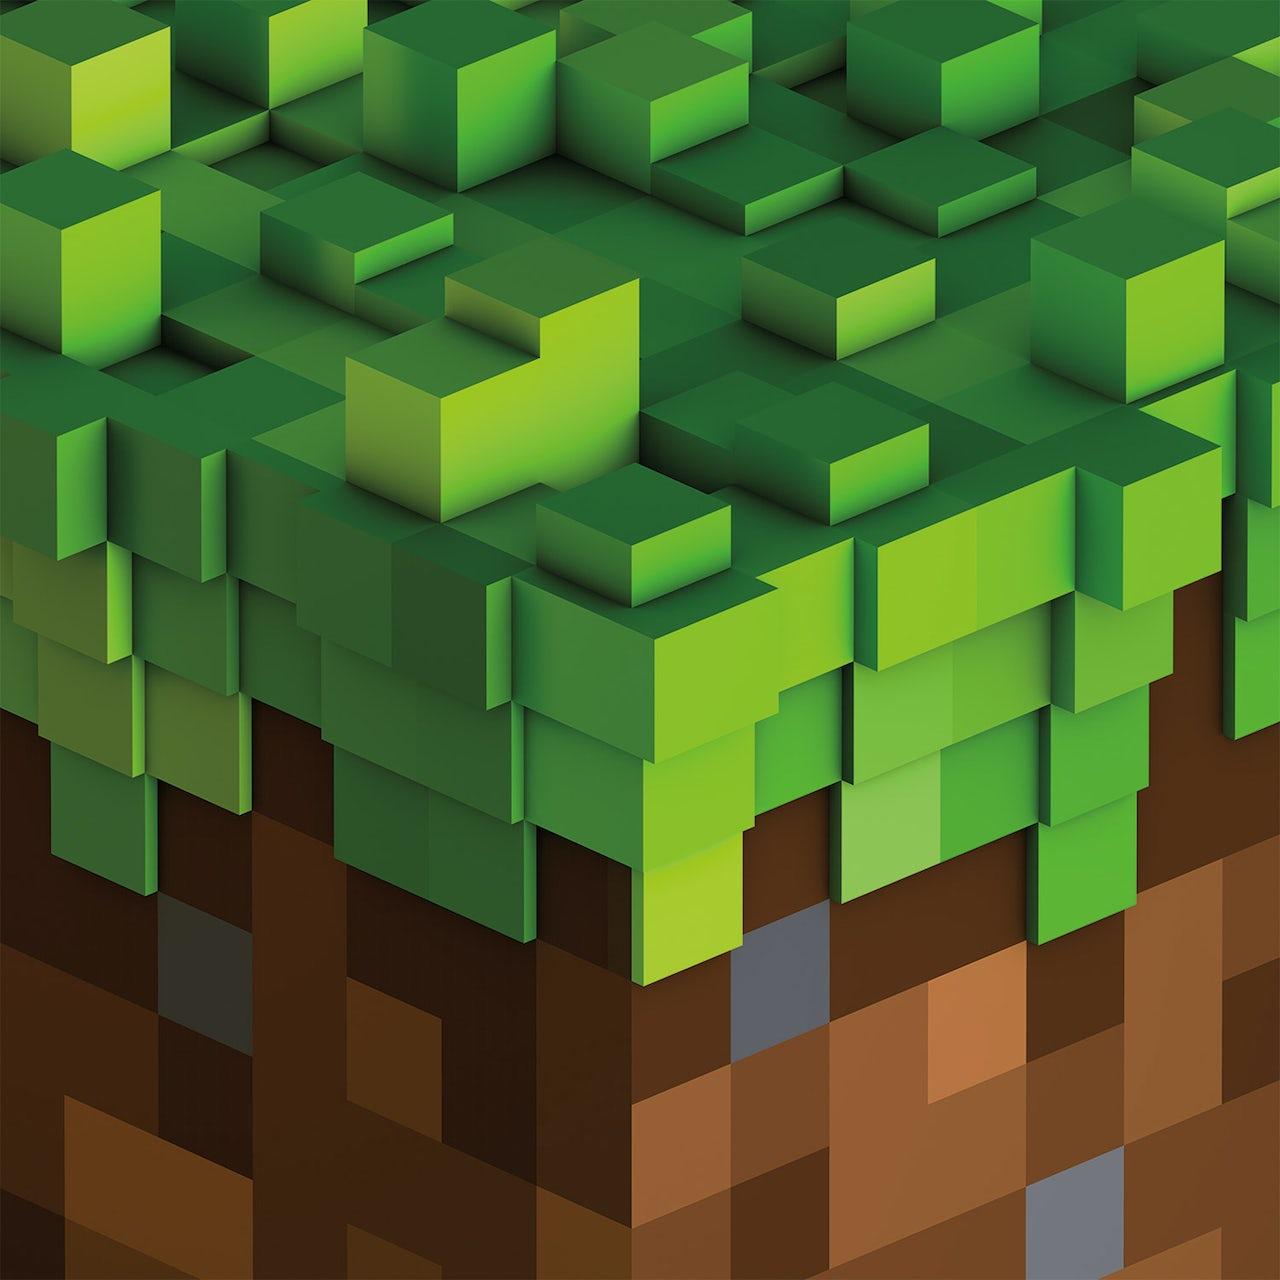 C418 Colv Grn Minecraft Volume Alpha Transparent Green Vinyl Vinyl Record